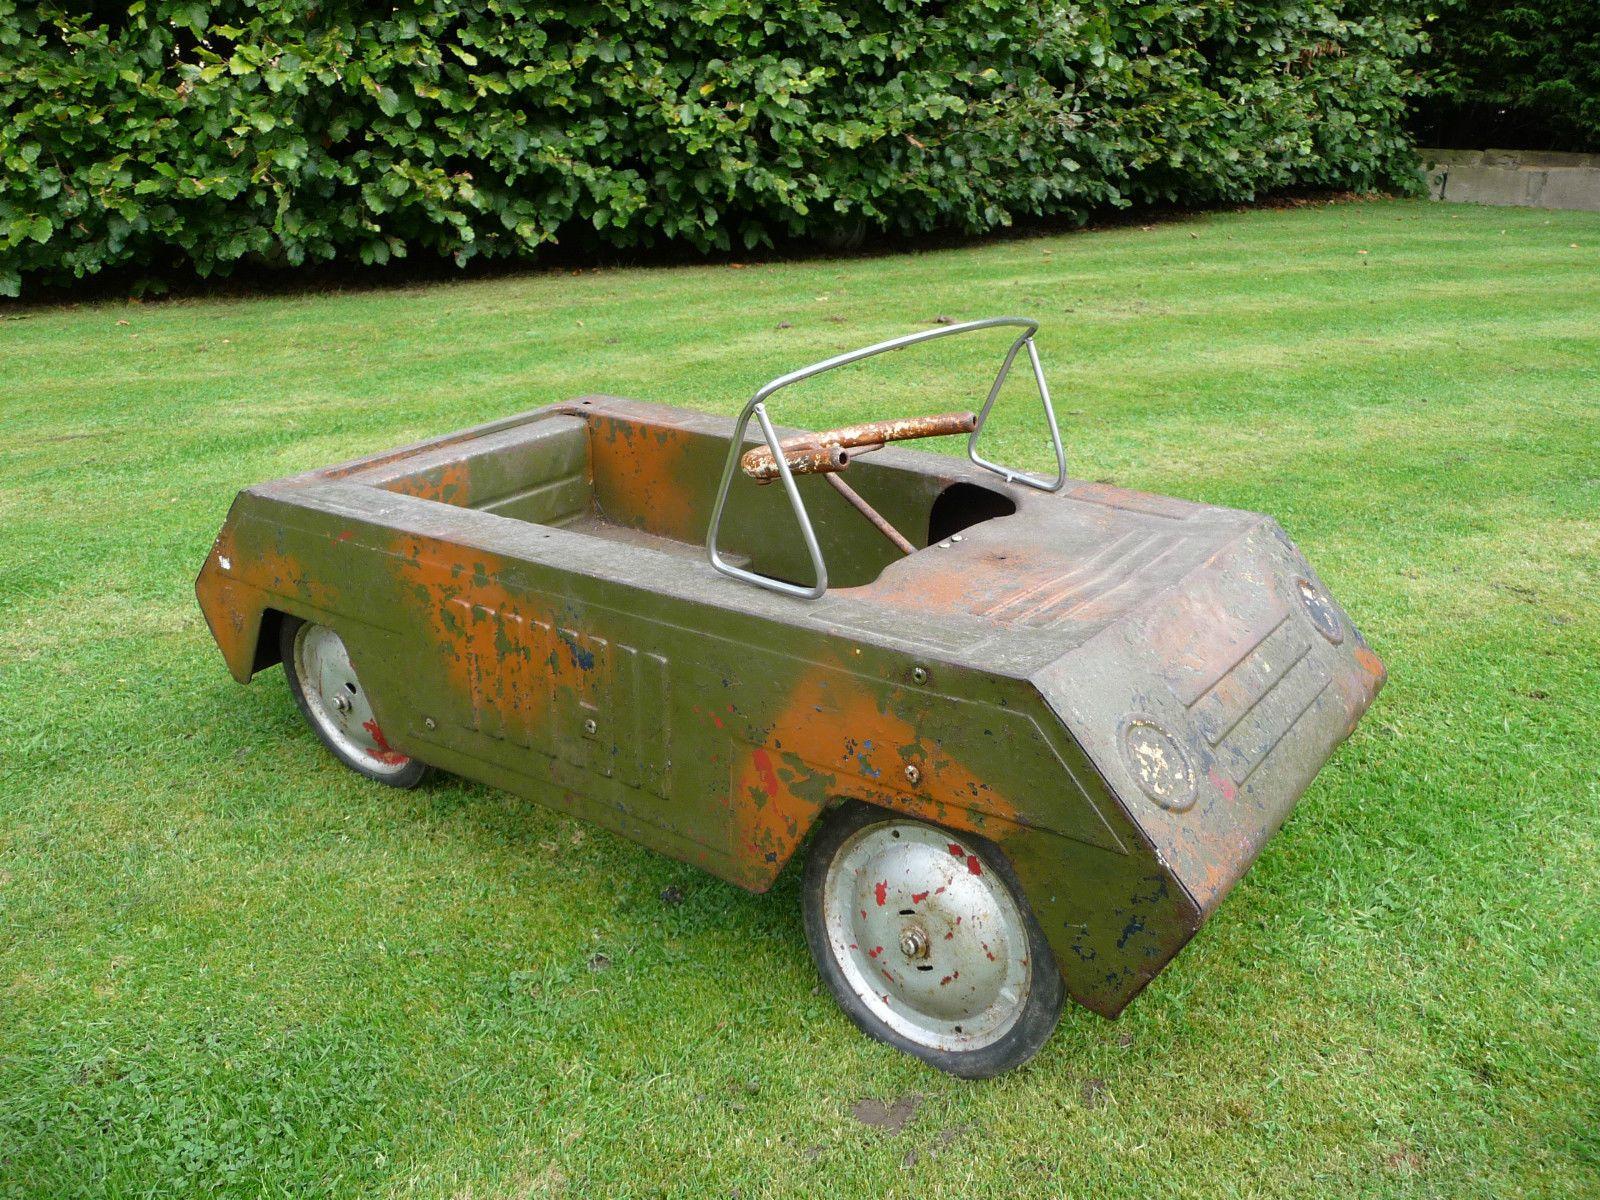 Triang Pedal Car Tank - http://www.ebay.co.uk/itm/371162634805 ...